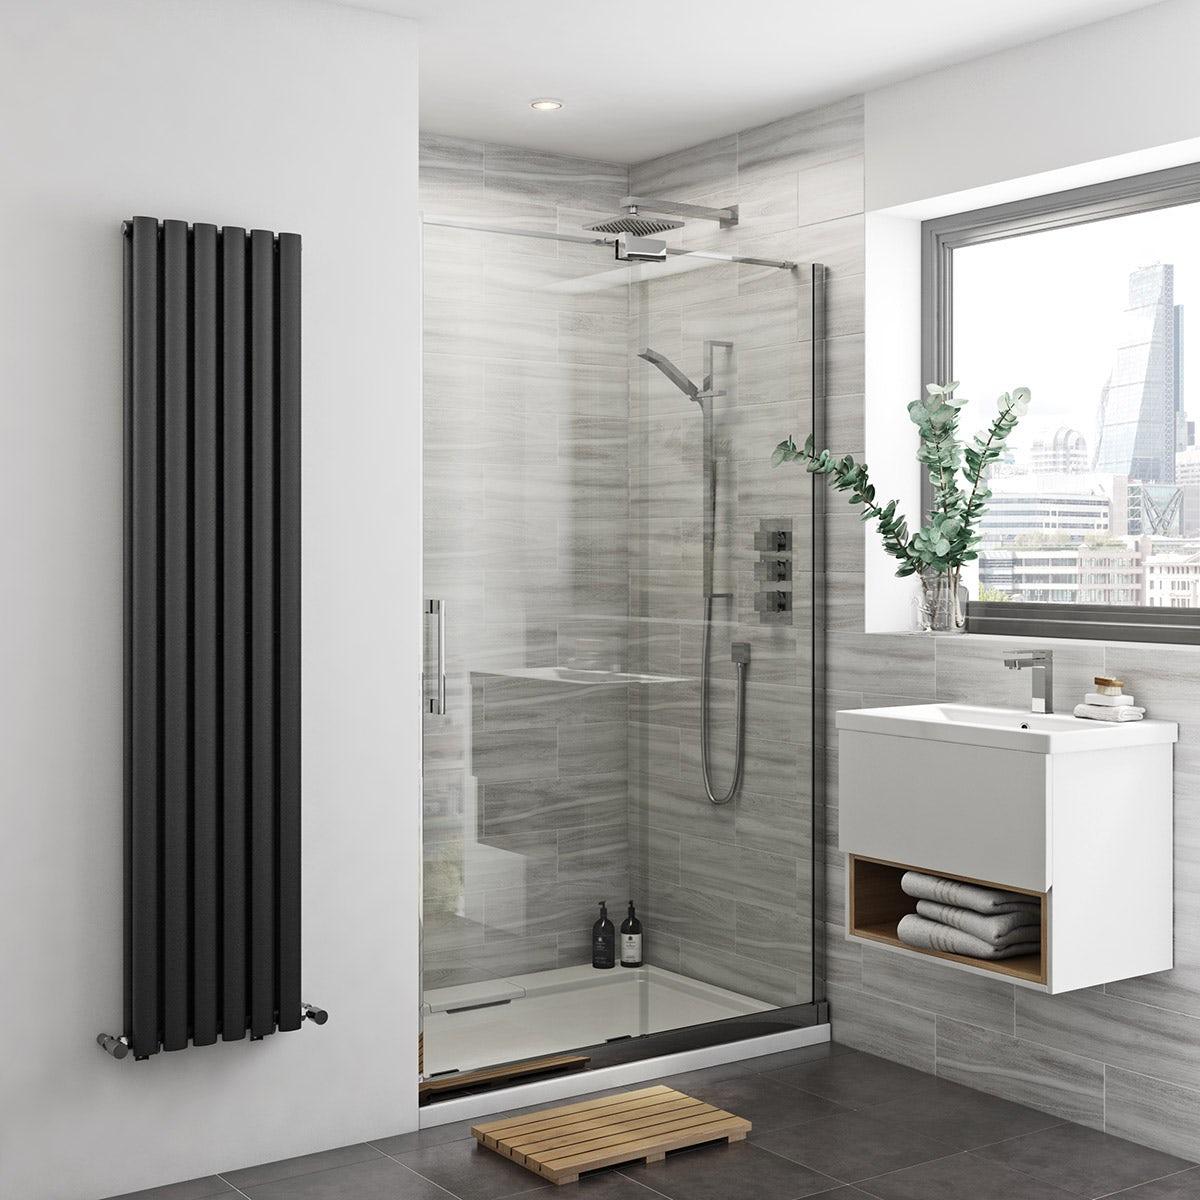 Mode Carter premium 8mm easy clean right handed sliding shower door 1200mm